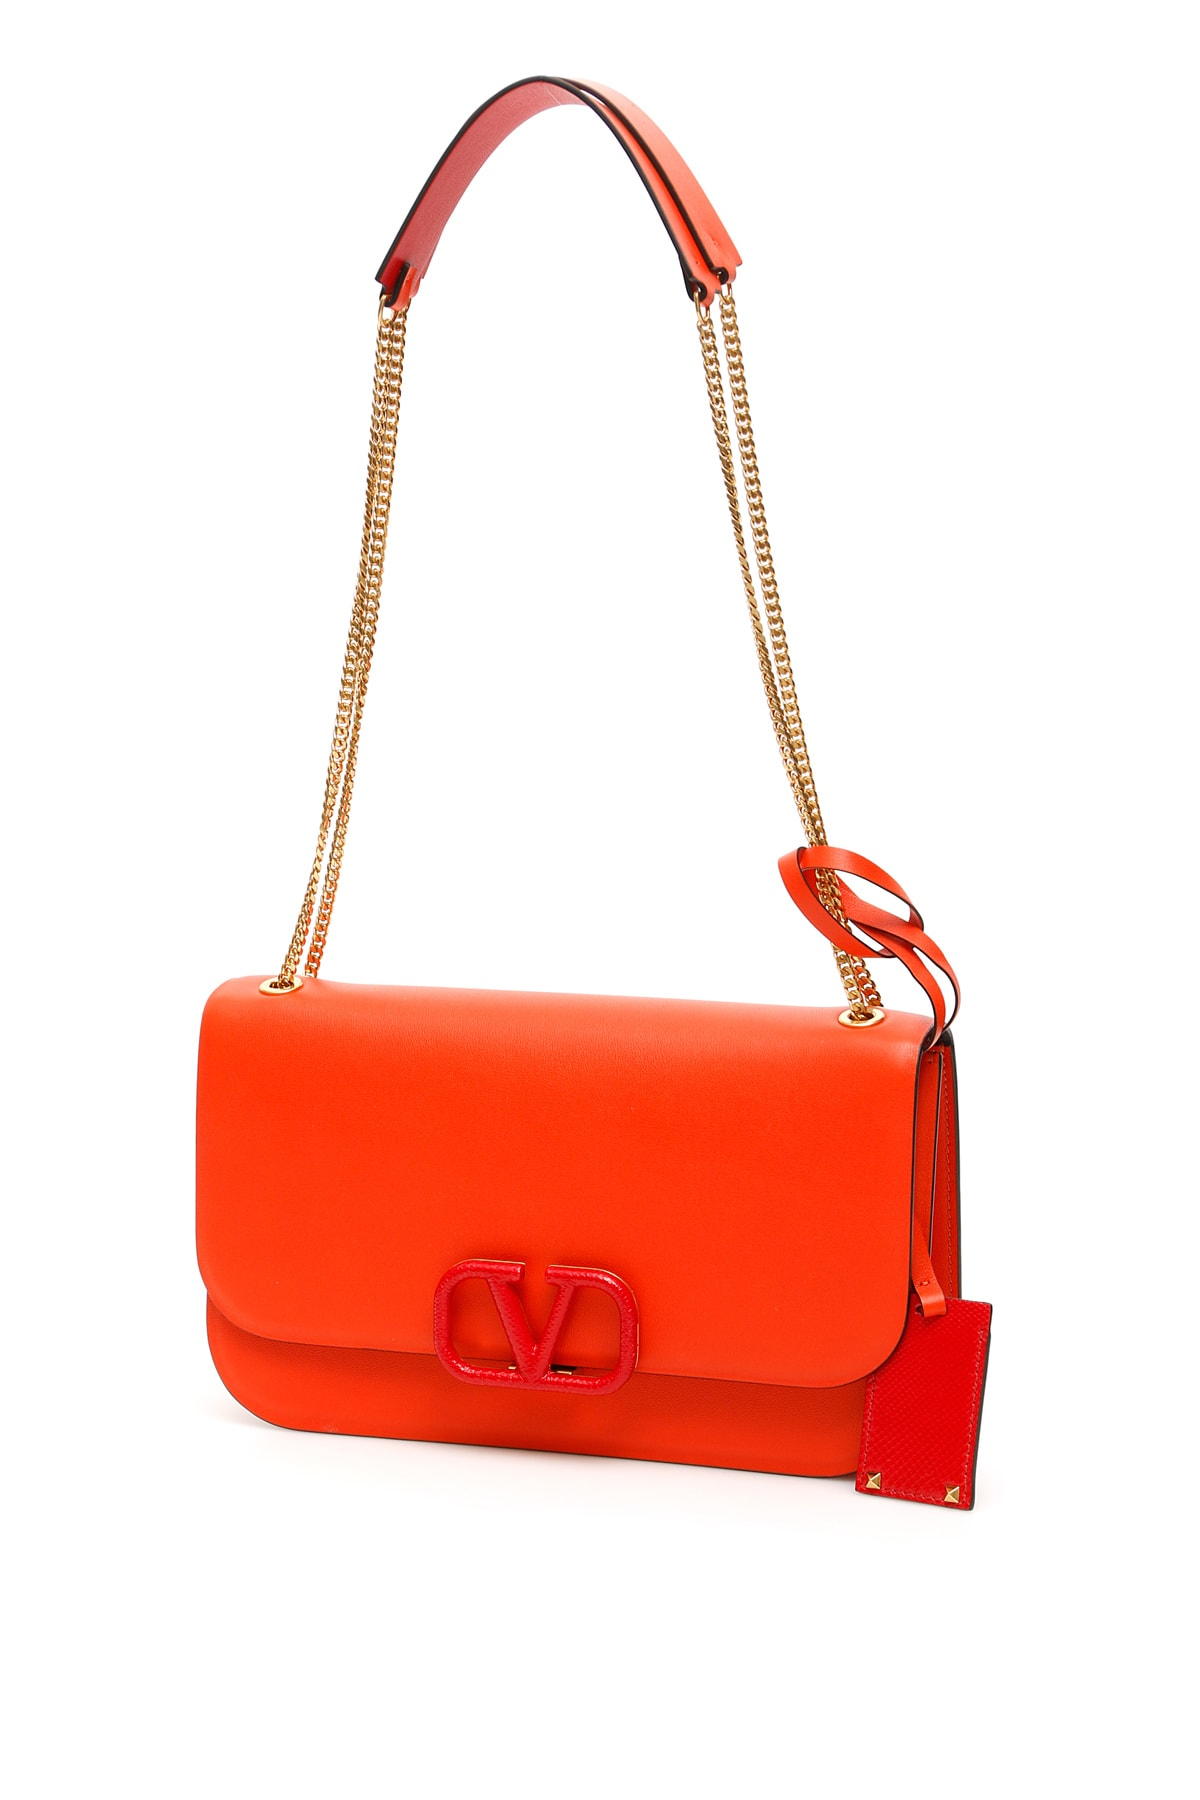 Valentino Garavani Vlock Shoulder Bag